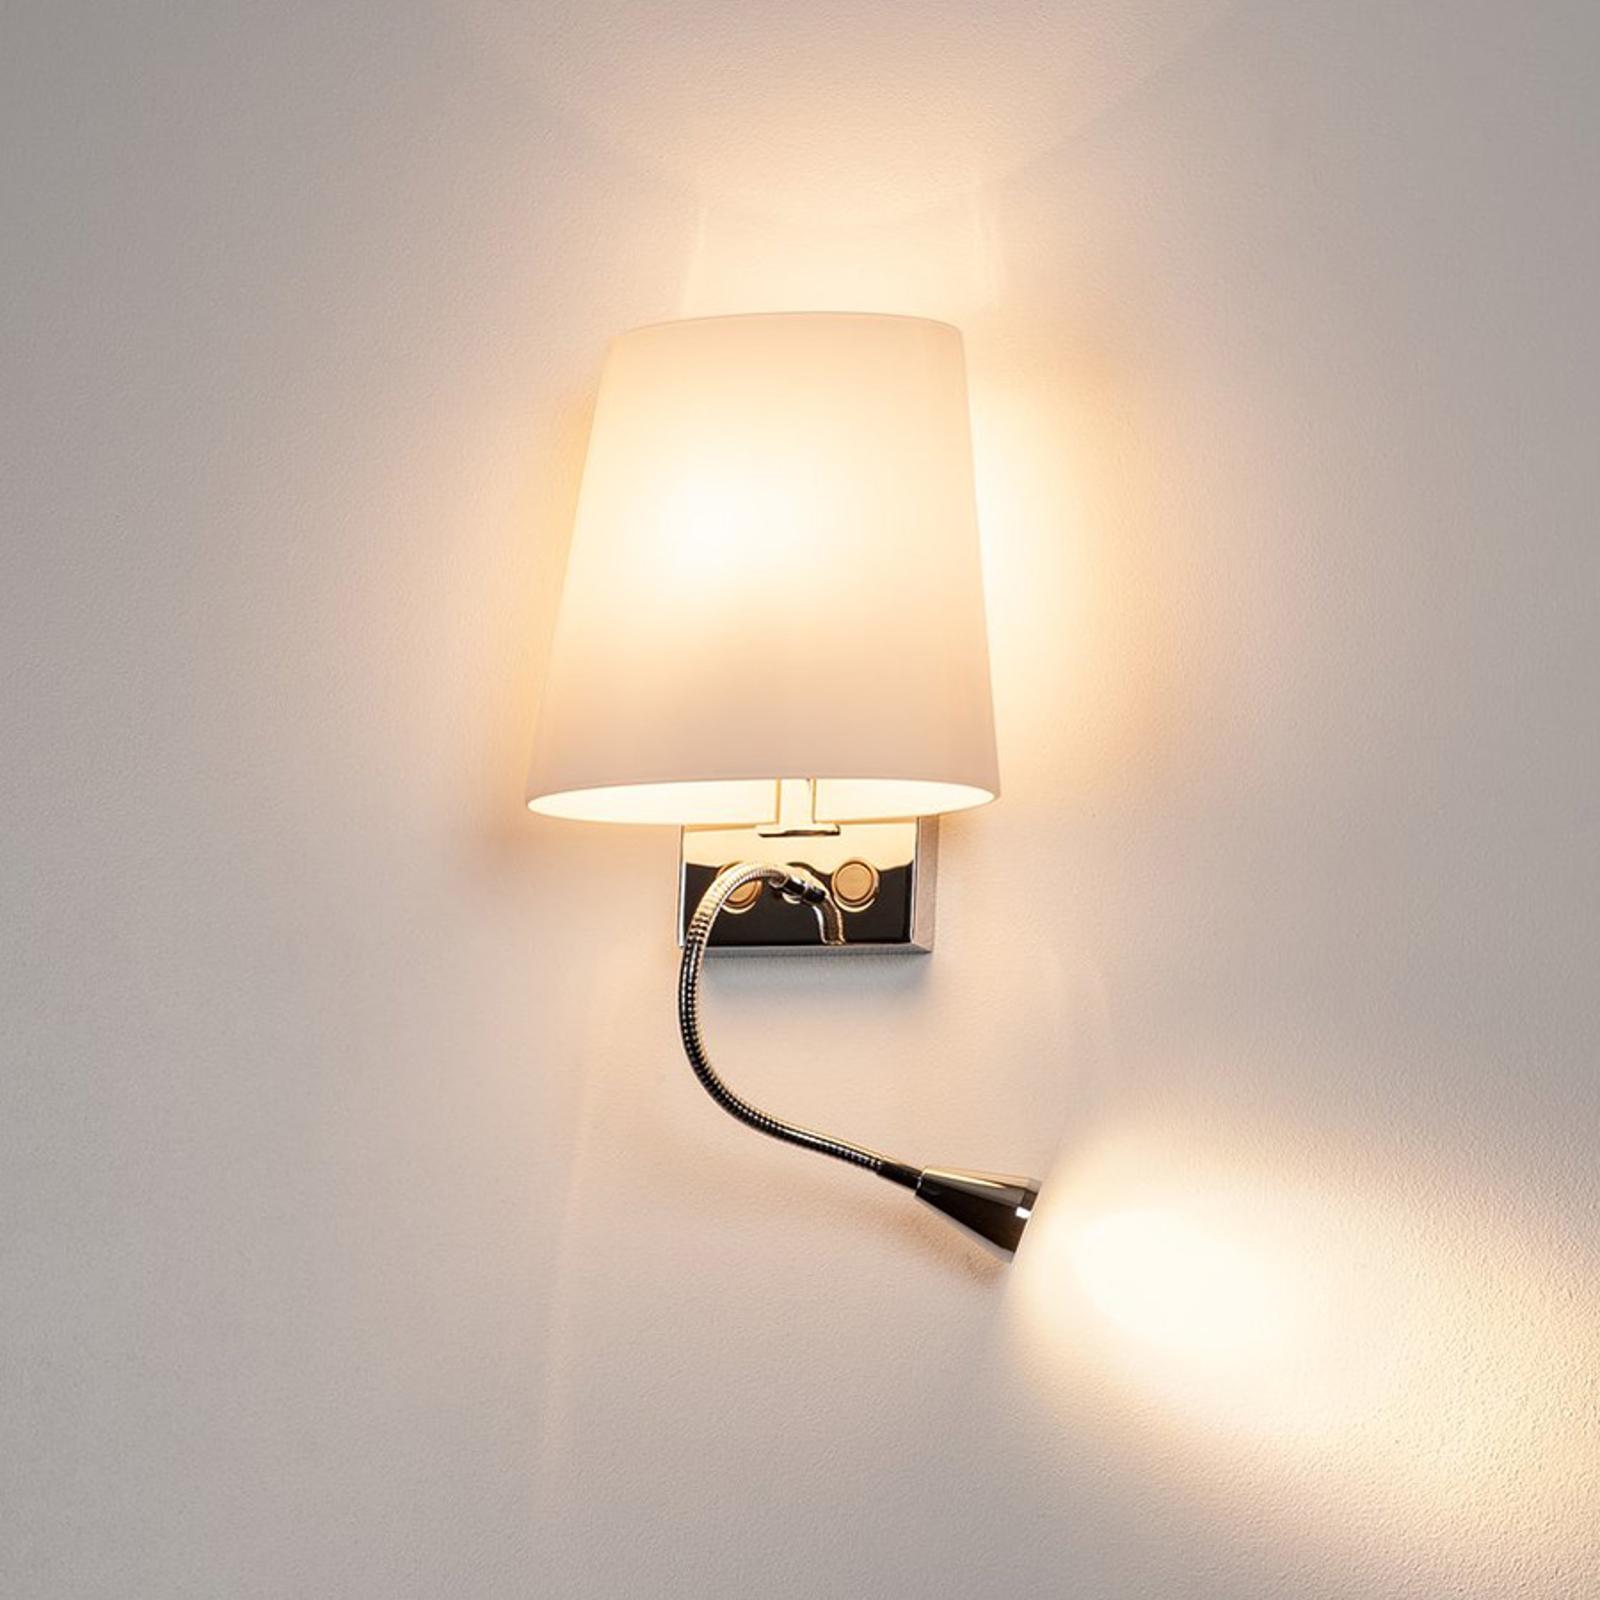 Actuele wandlamp COUPA met led's